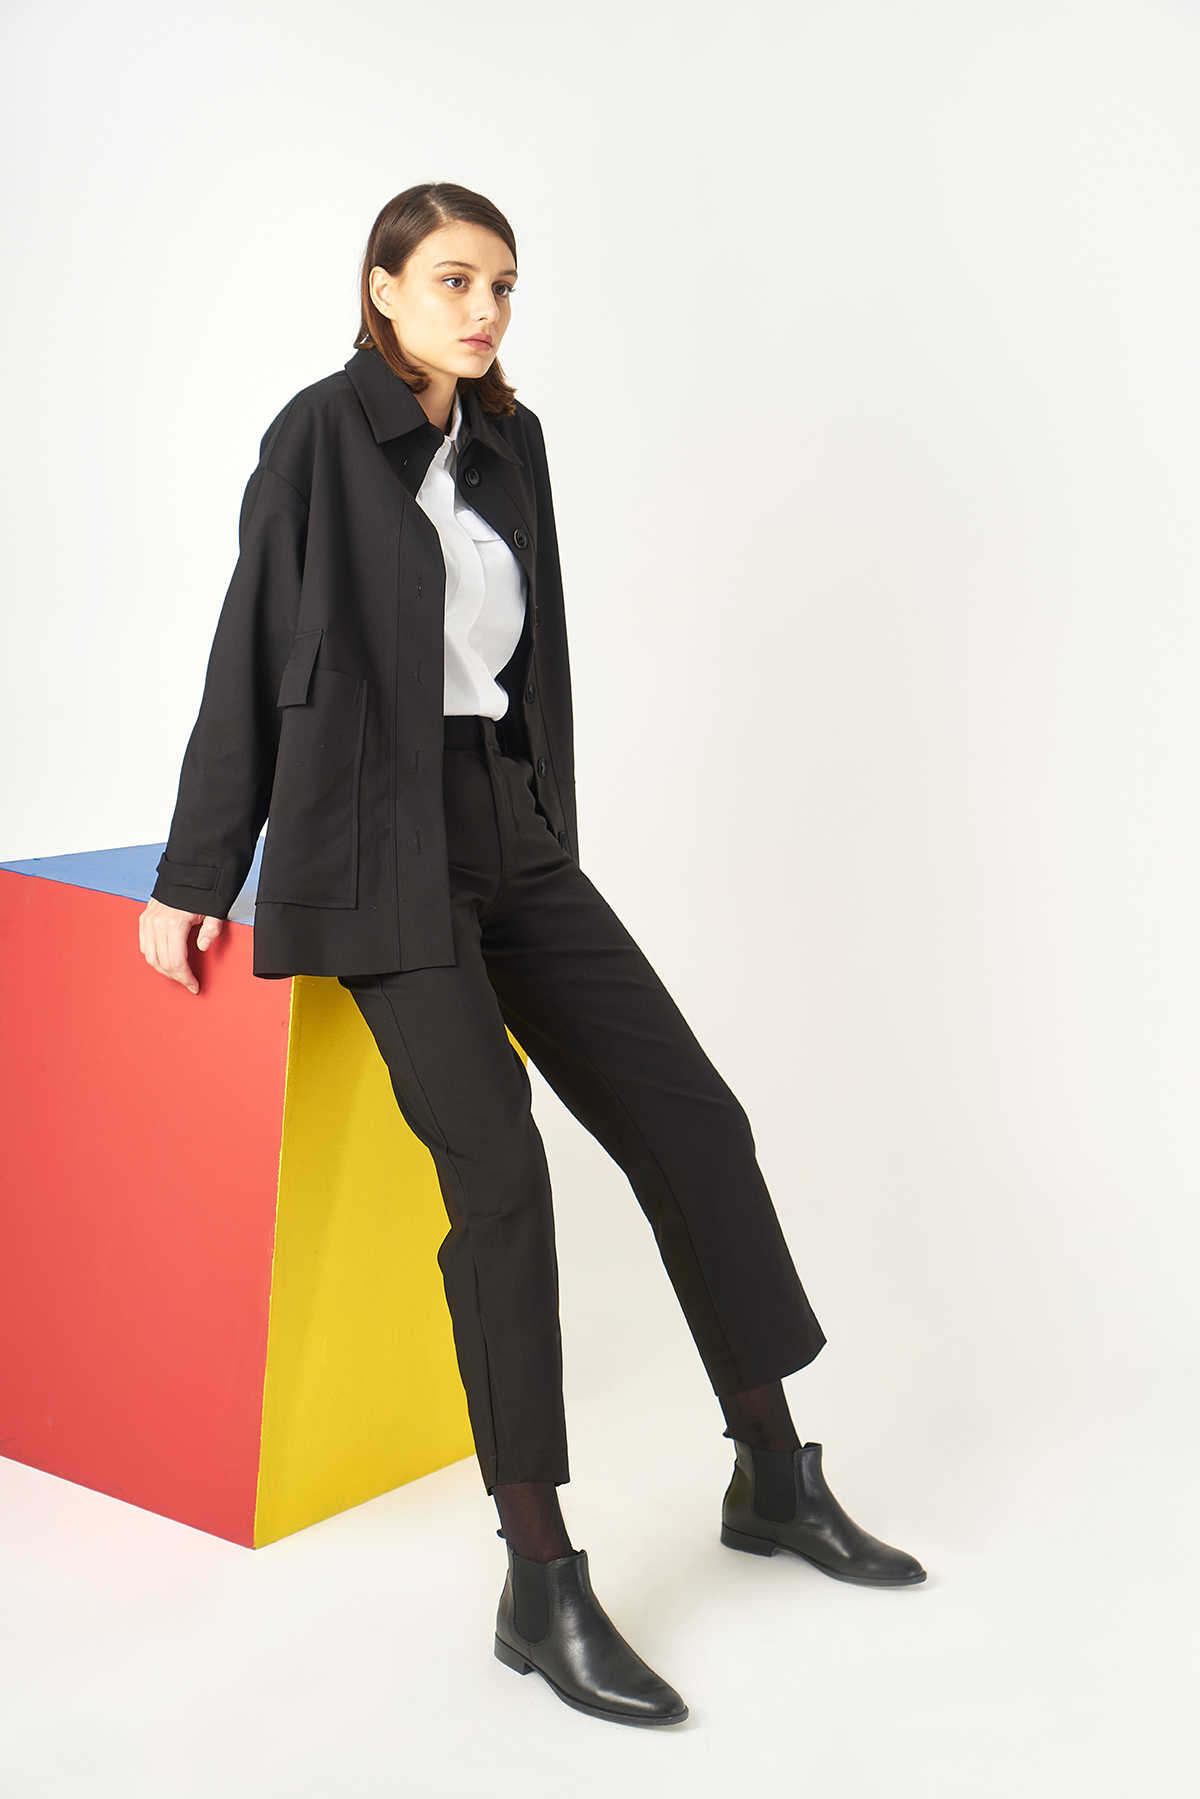 Kuaybe Gider - Kuaybe Gider Siyah Kadın Palto 7103